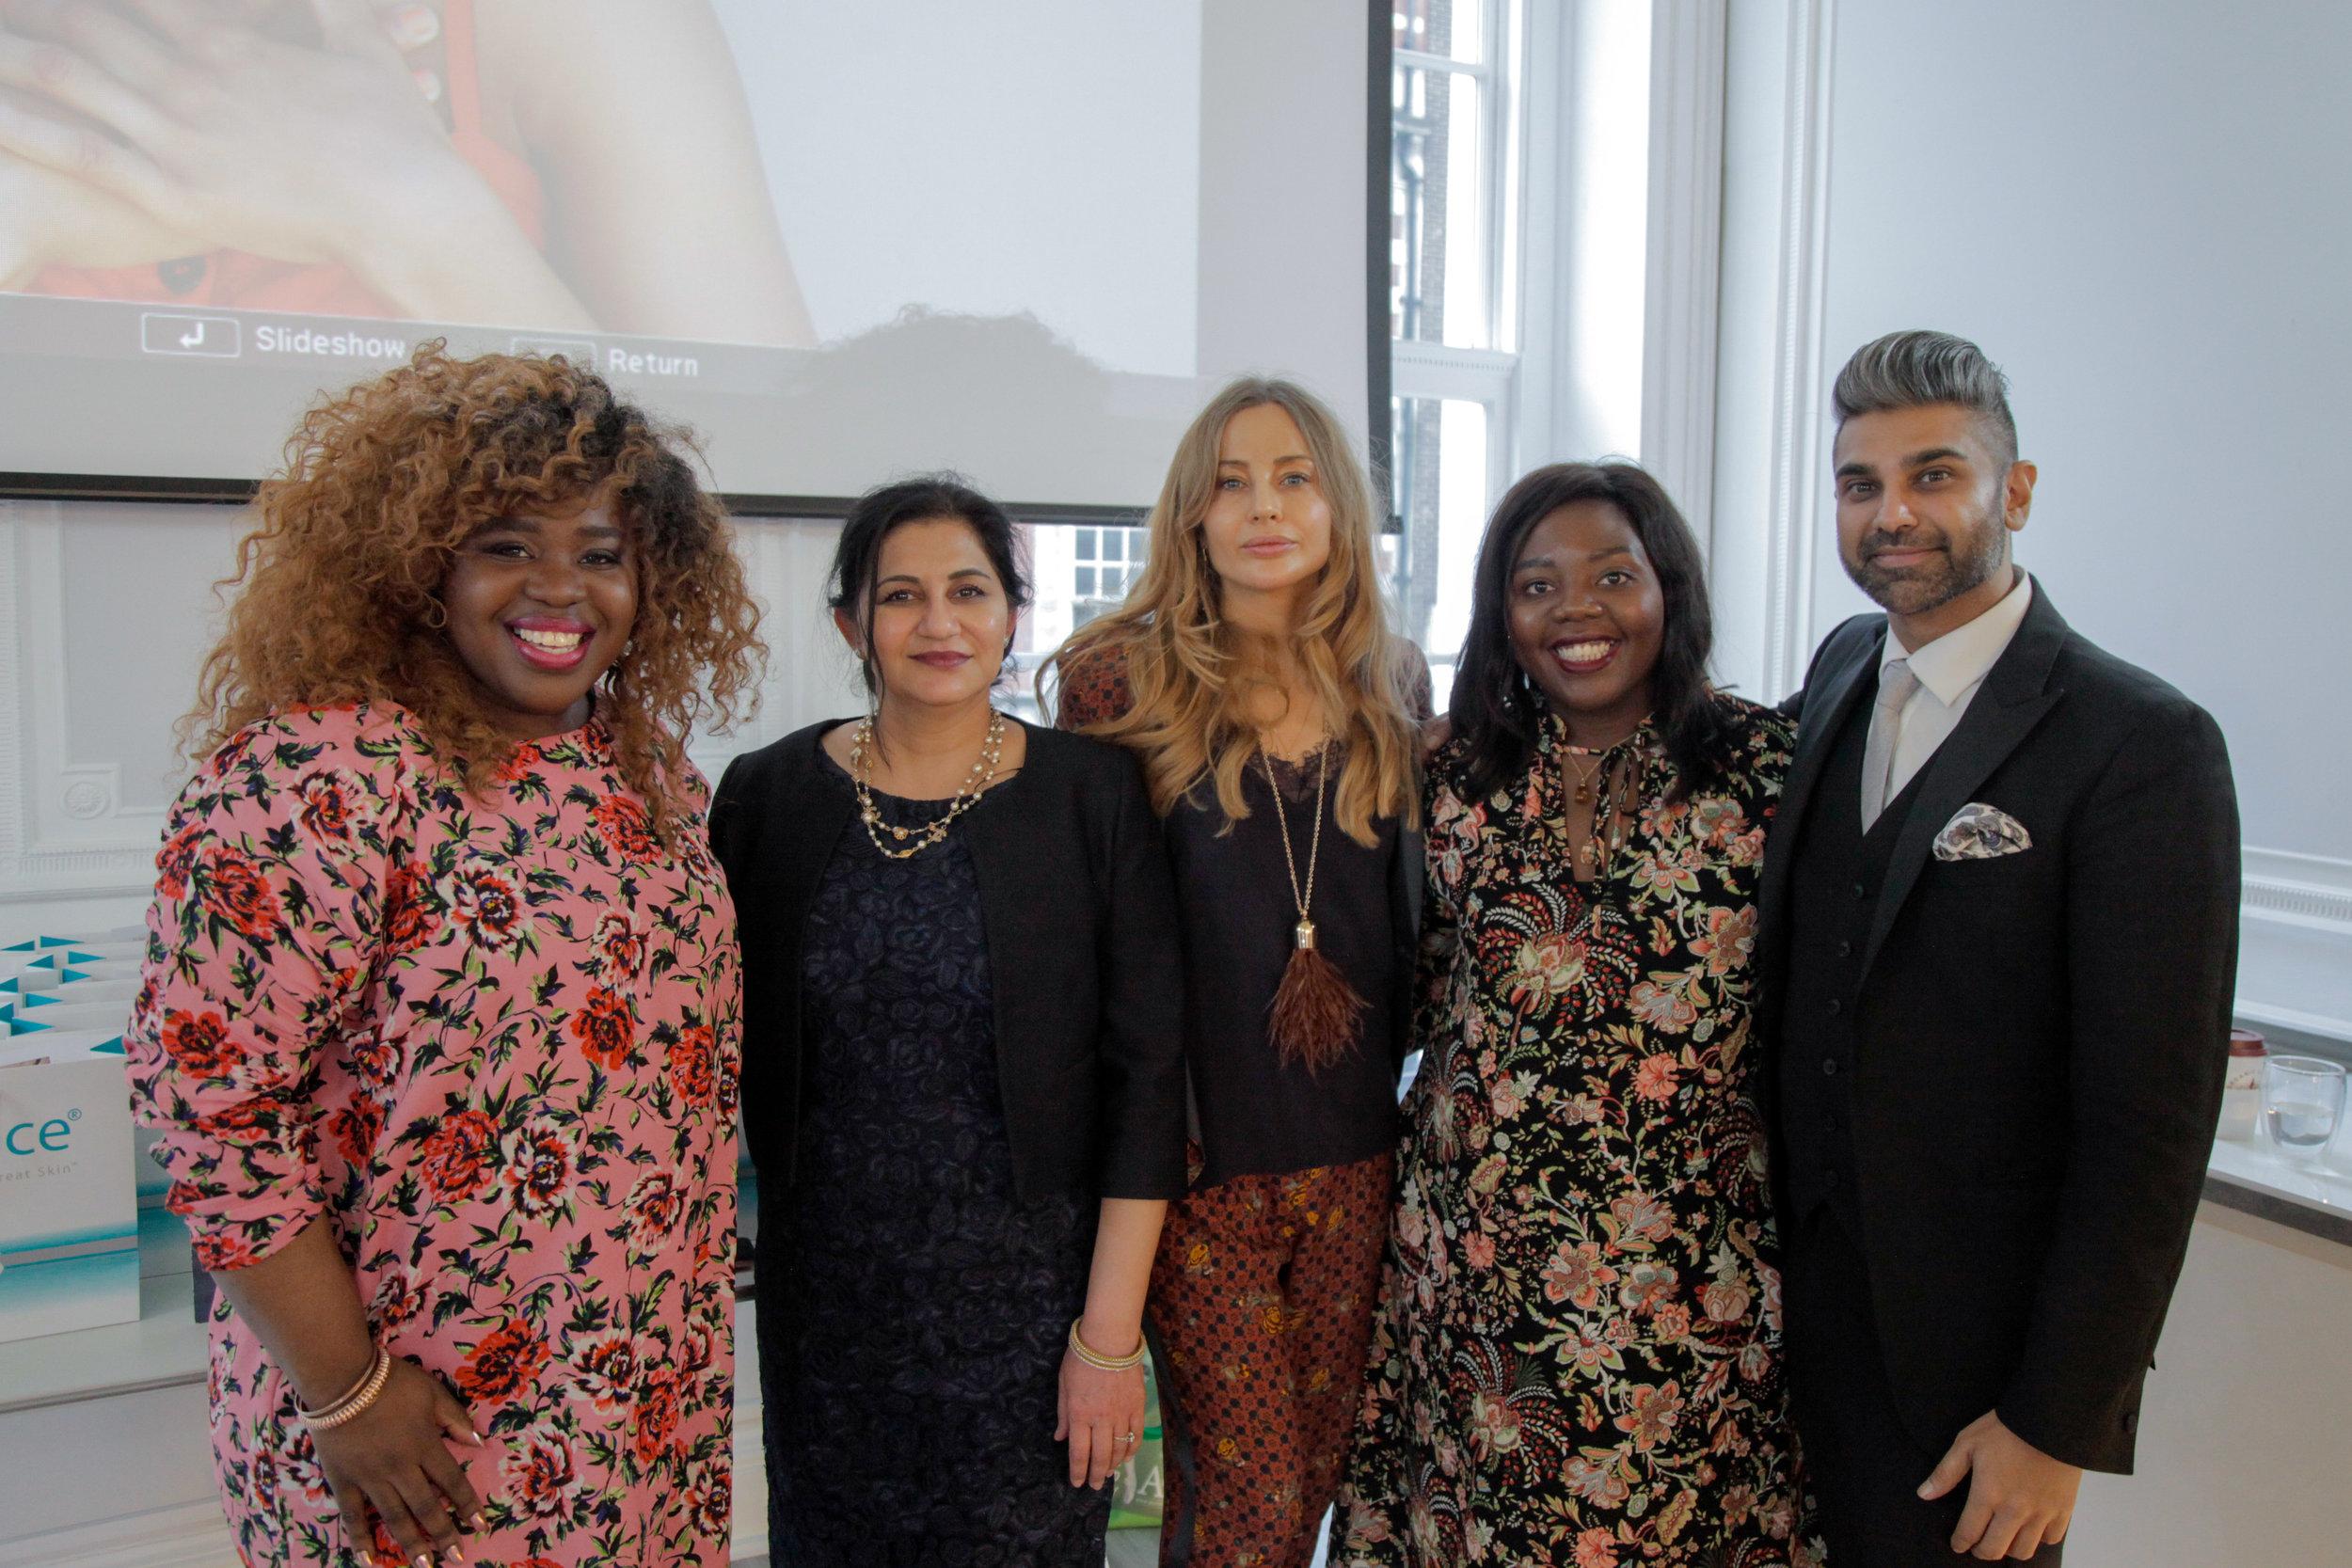 Left to right: Natalie Clue (Keziah CONNECTIONS), Dr Bhavjit Kaur (Health & Aesthetic Clinic), Dr Barbara Kubicka (Clinicbe), Dija Ayodele (Black Skin Directory), Dr Rikin Parekh (Avanti Aesthetics).